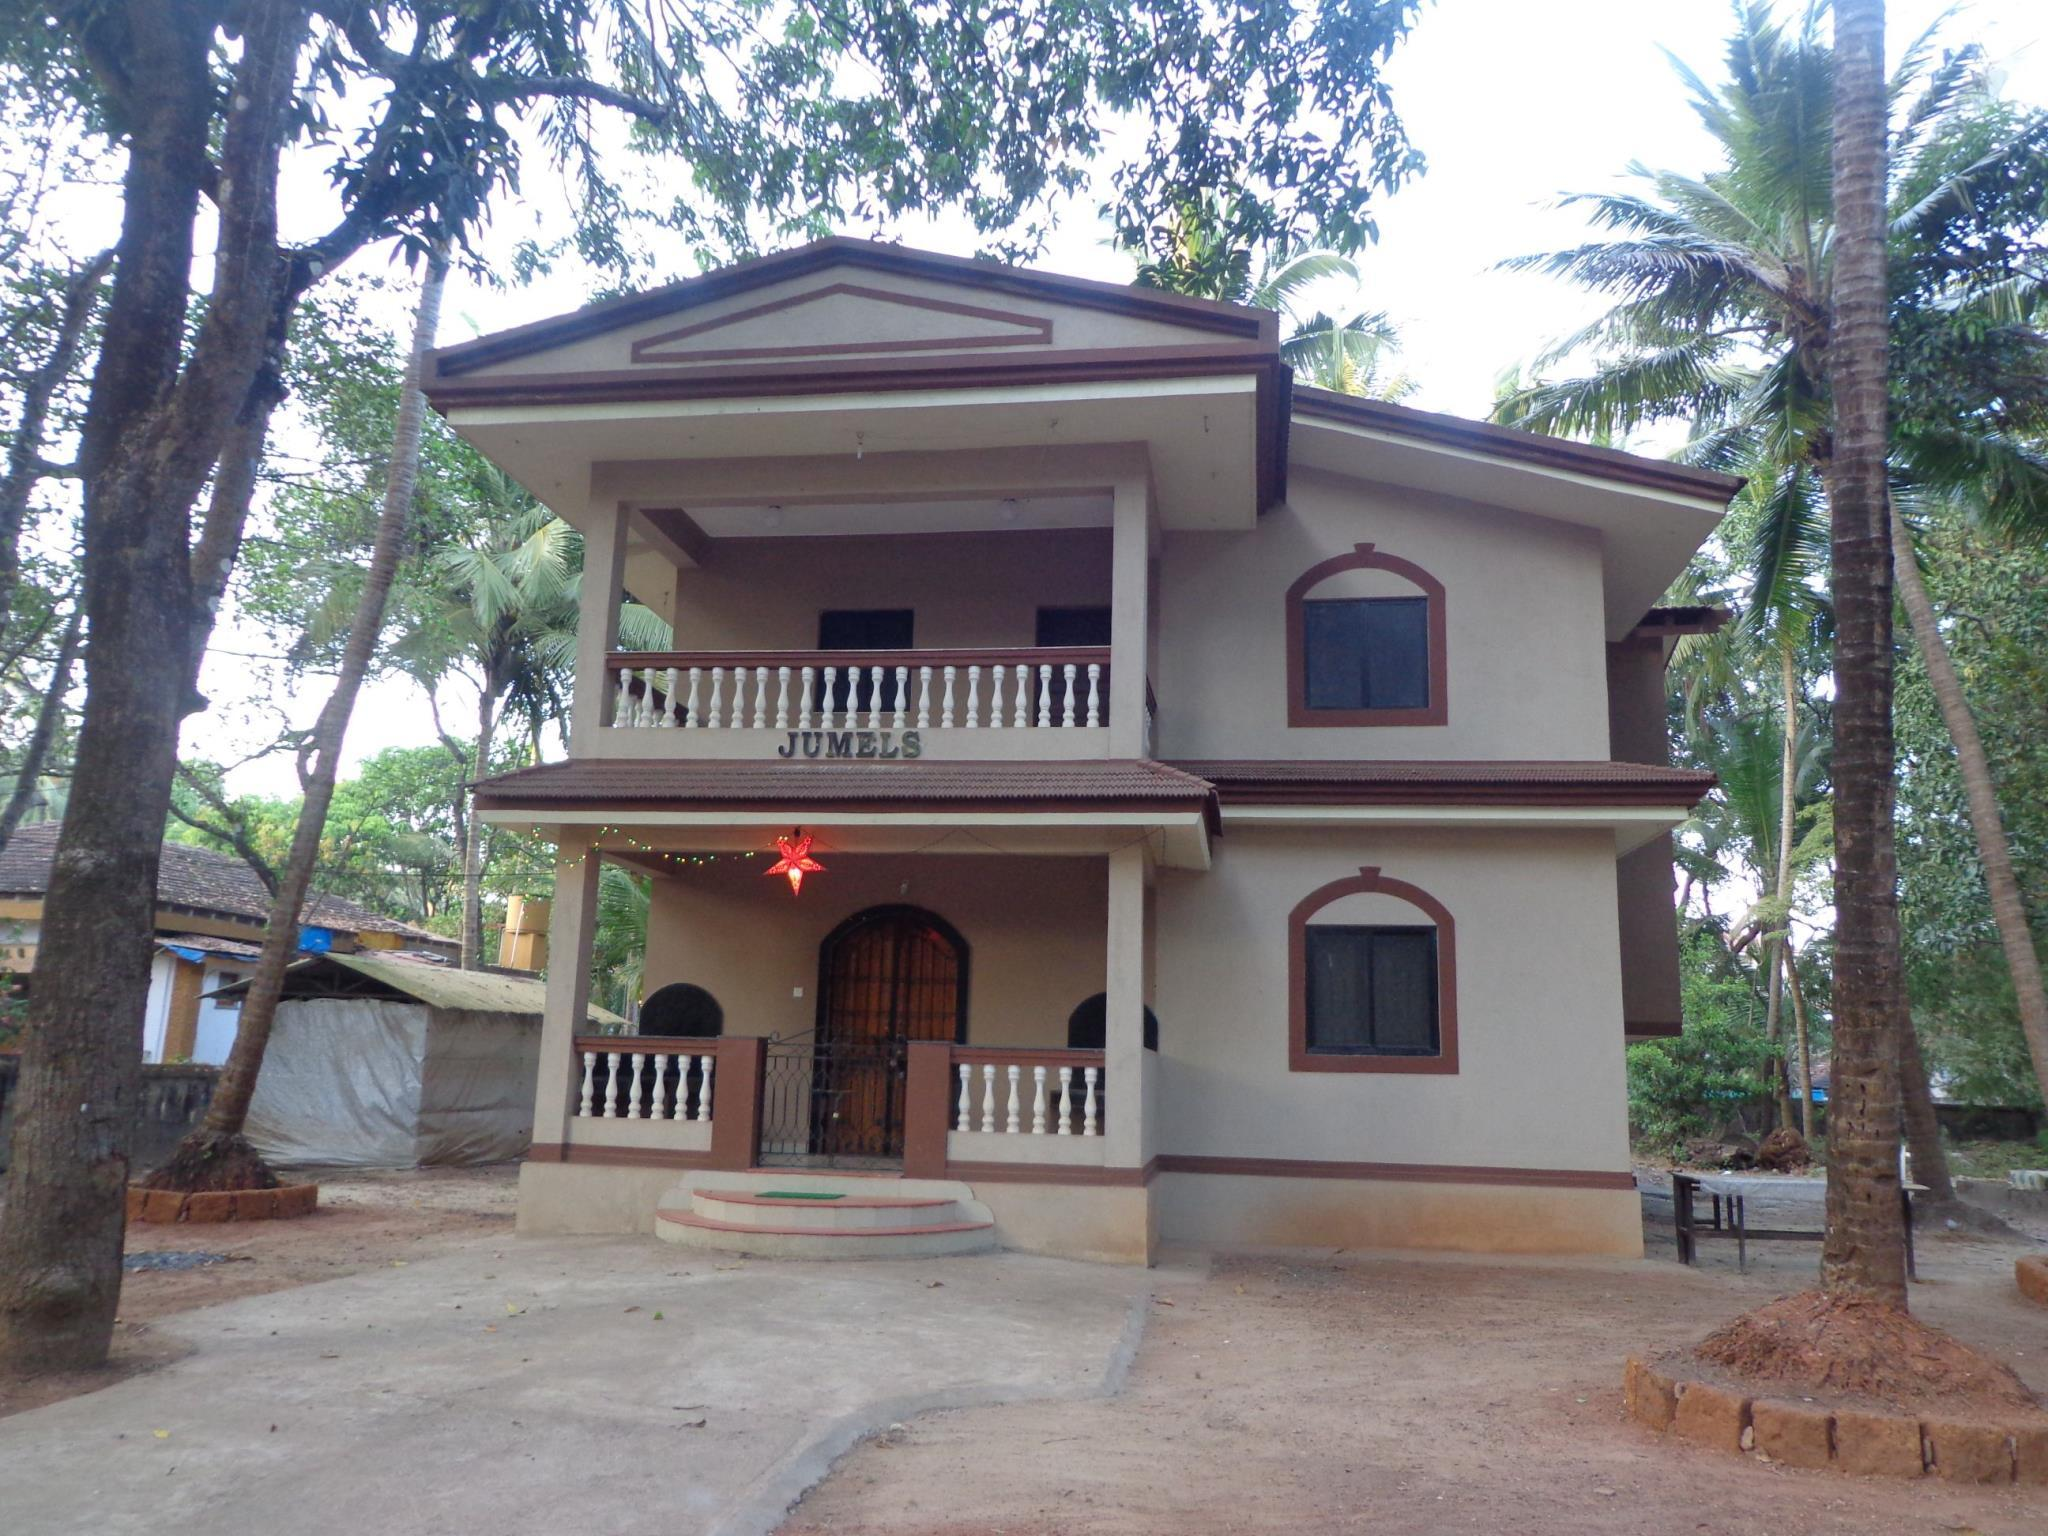 Jumels Guest House